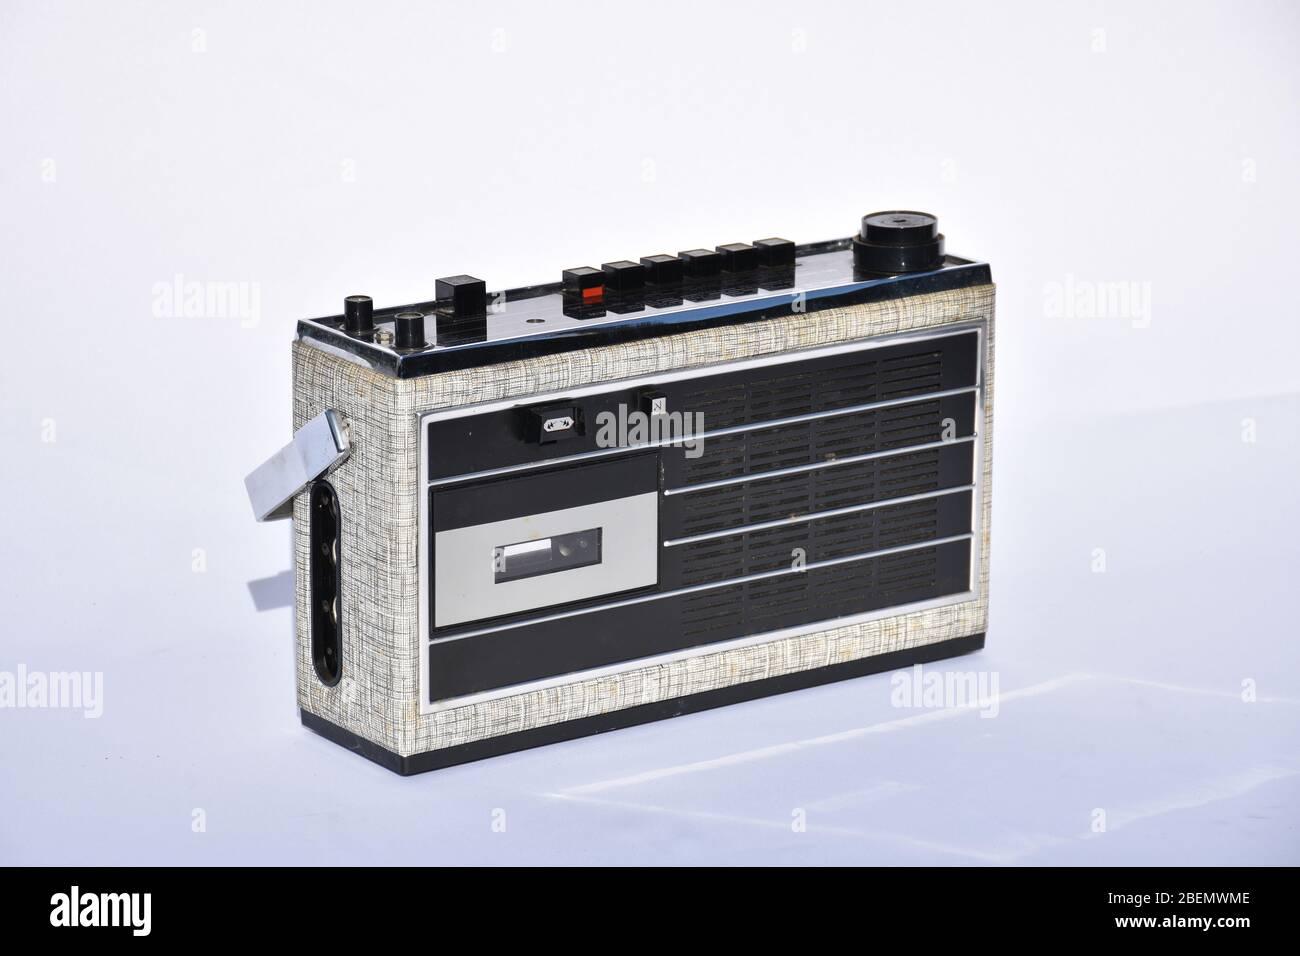 Hornyphon Caballero, Hornyphon, Caballero, Radiorekorder, Kofferradio, 1967, Kompaktkassette, Radio, Kassette, Fortschritt, Modern, zeitgemäß, jung, T Stock Photo